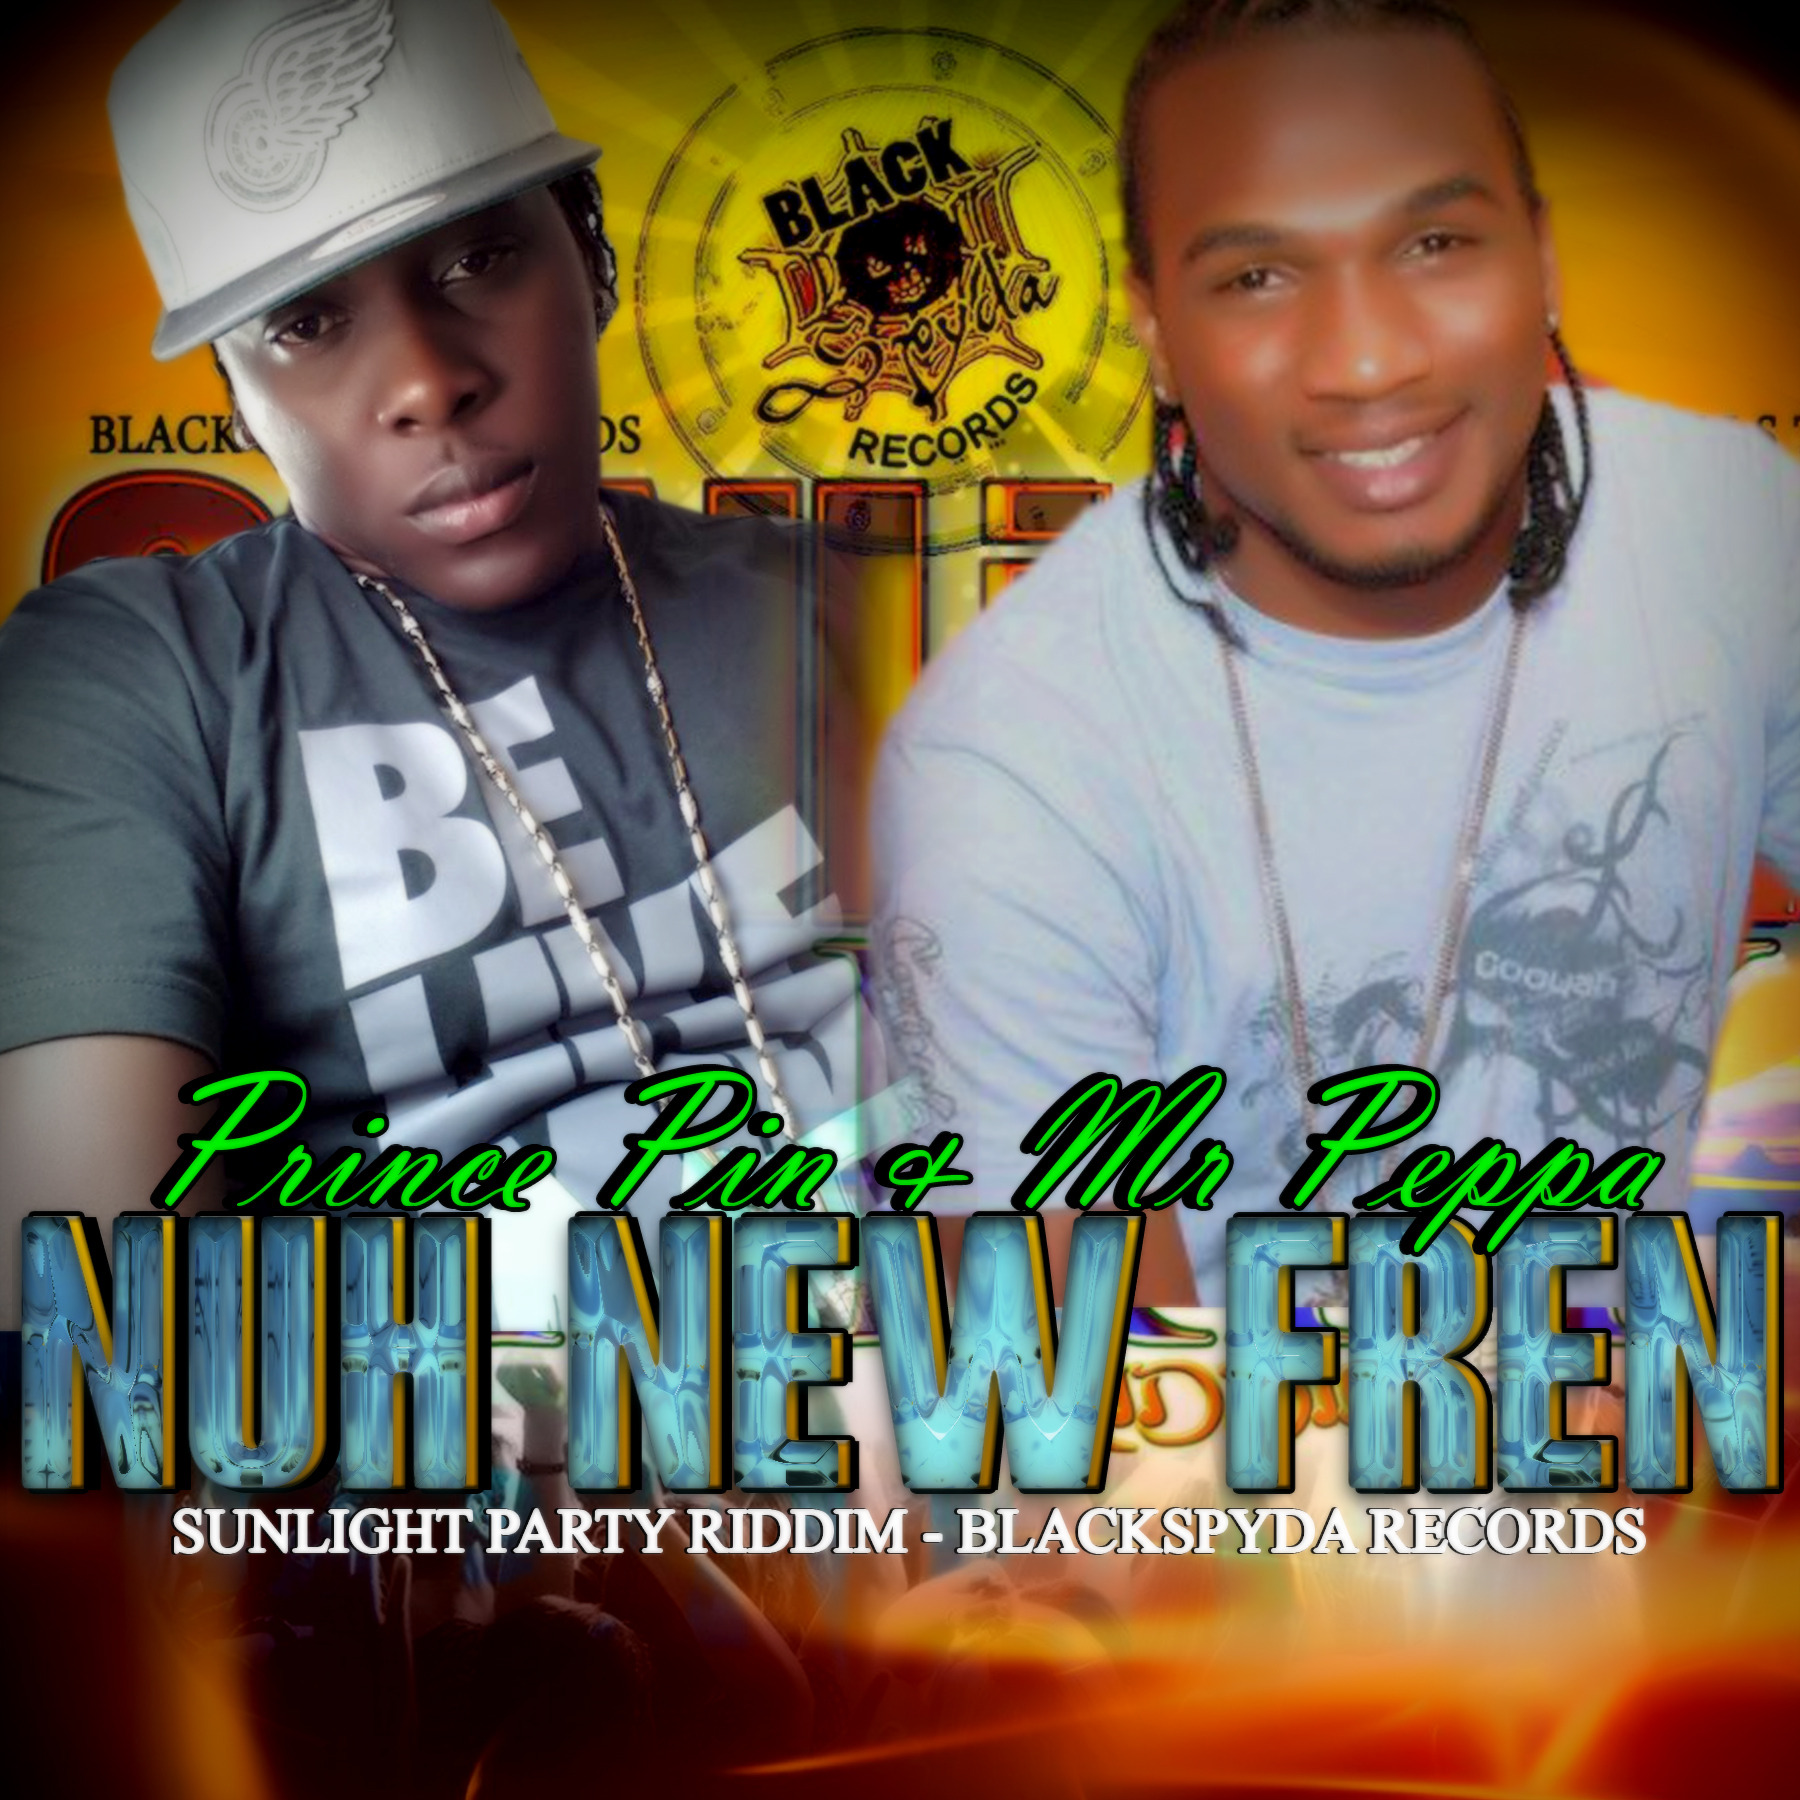 Prince-Pin-Mr-Peppa-Nuh-New-Fren-Sunlight-Party-Riddim-Blackspyda-Records-Cover